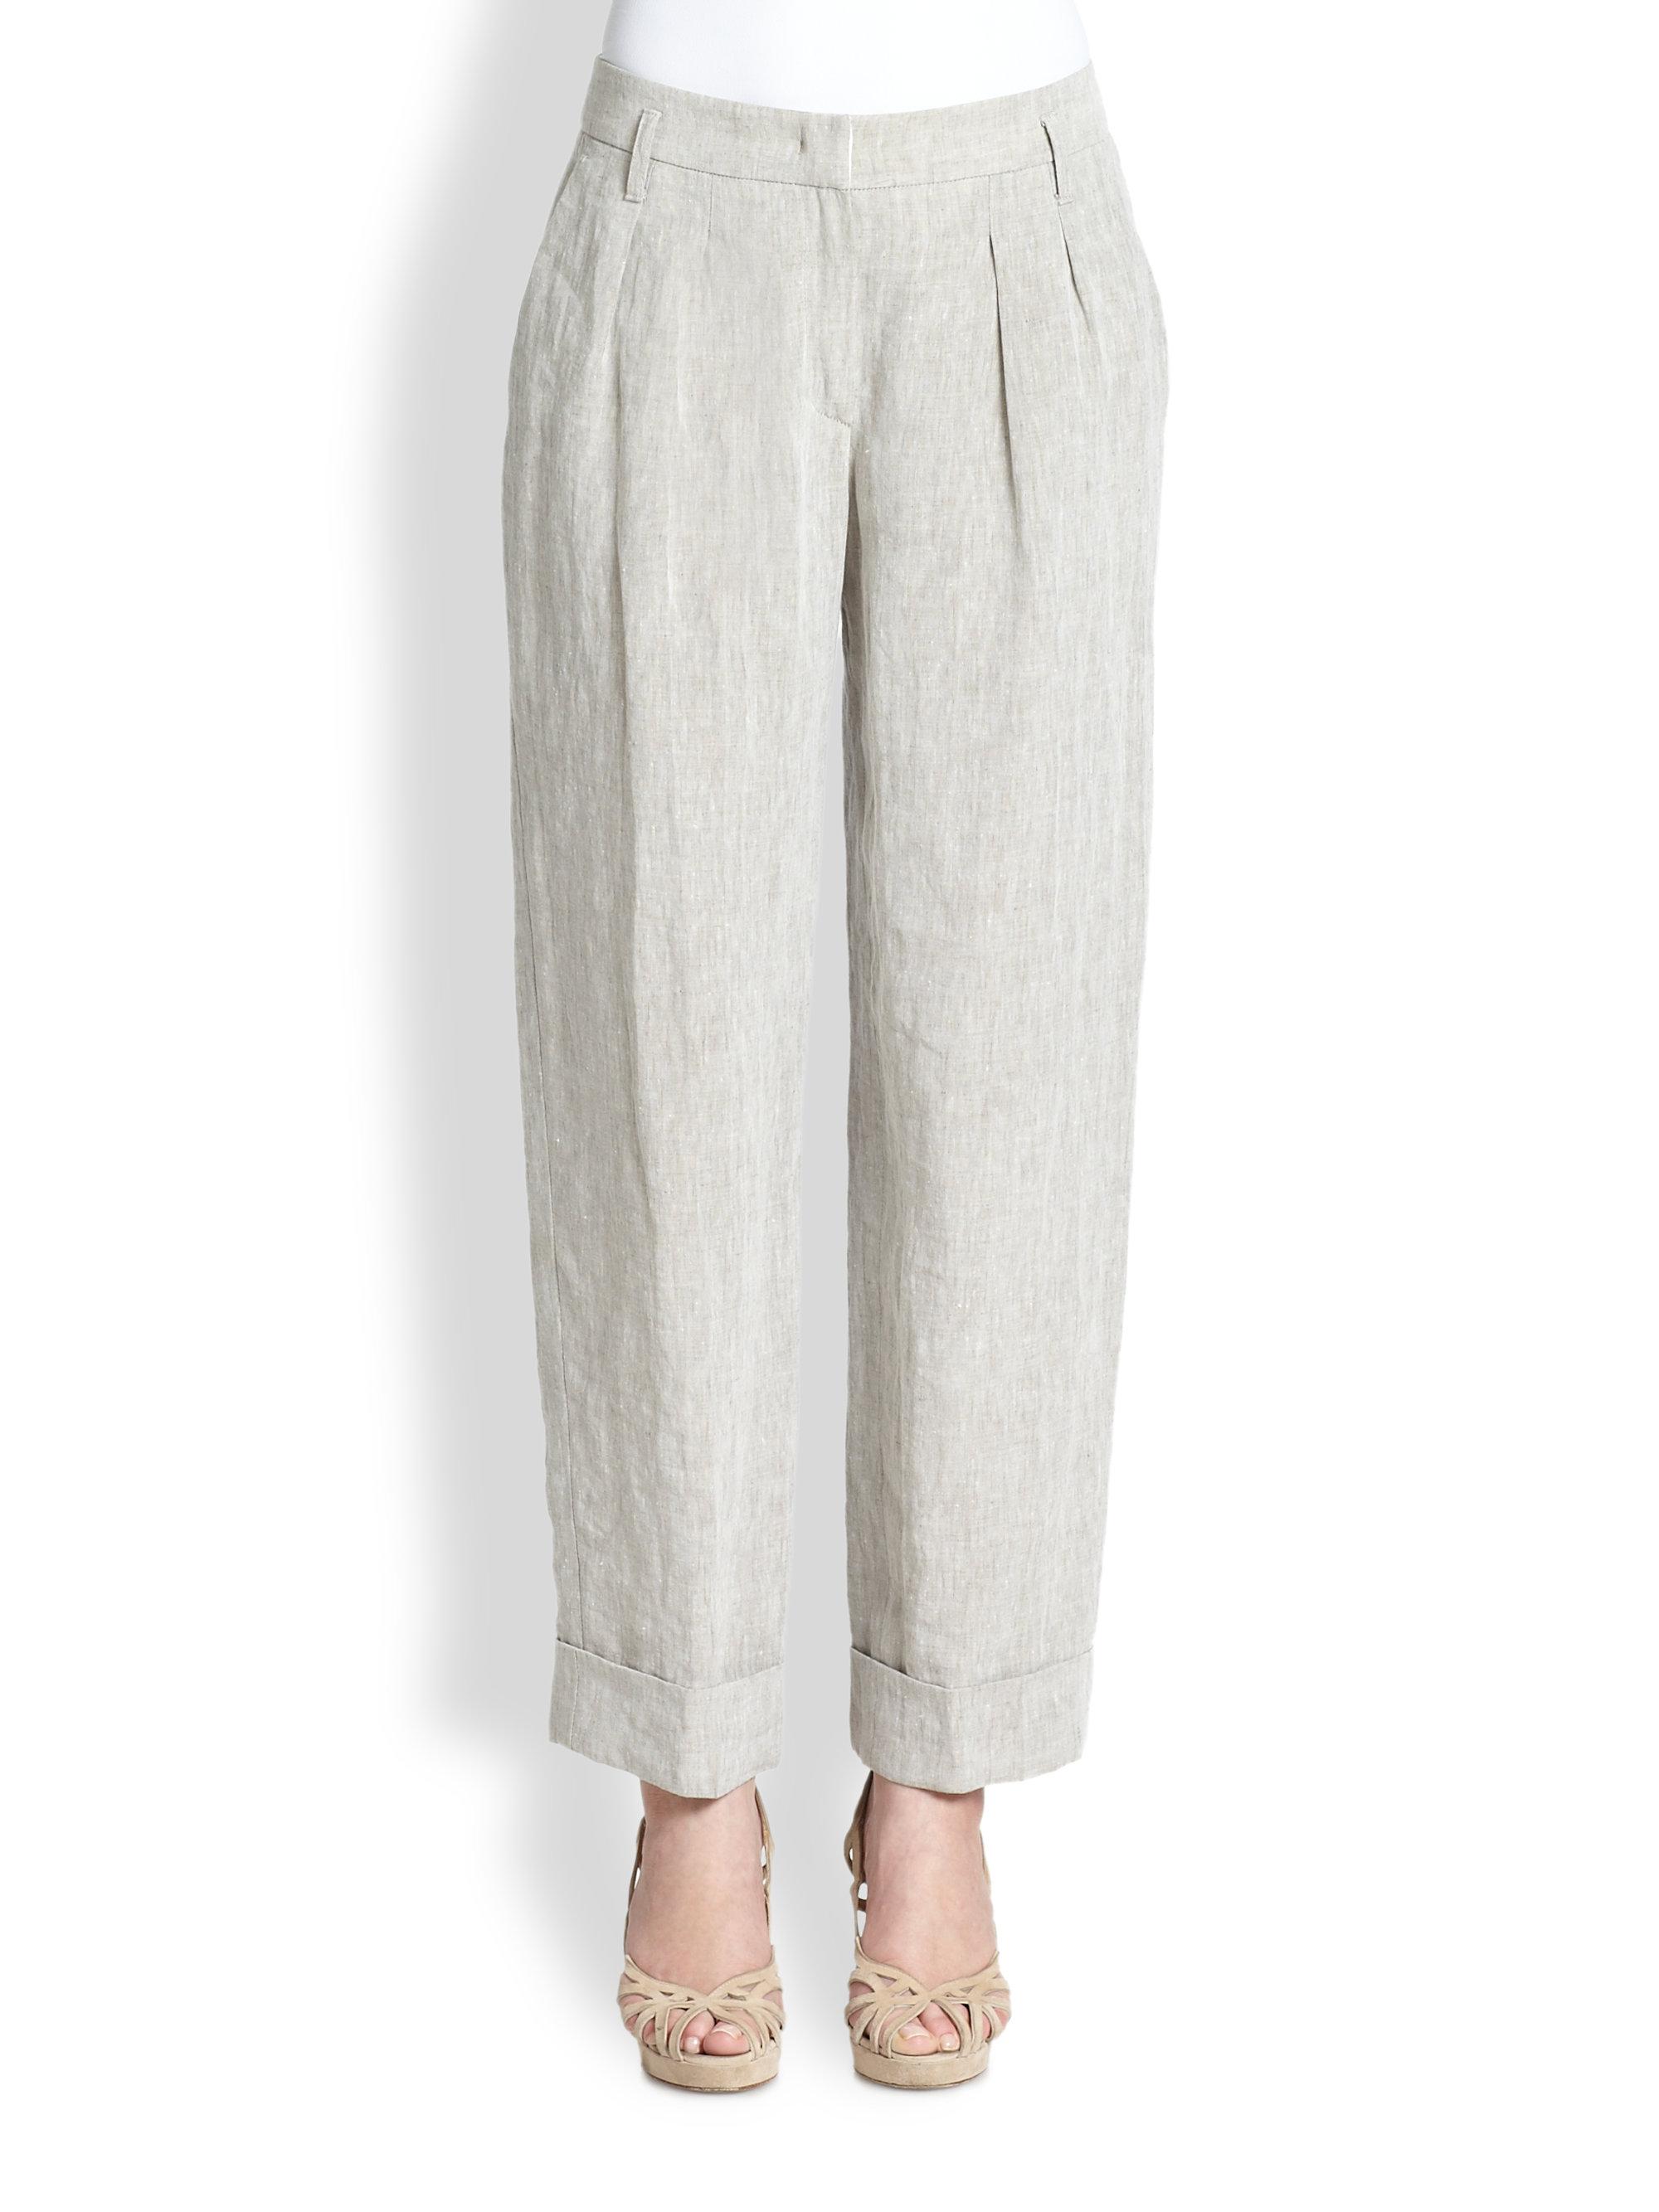 Fantastic Grey Linen Pants Women  Fantastic Blue Grey Linen Pants Women Style U2013 Playzoa.com